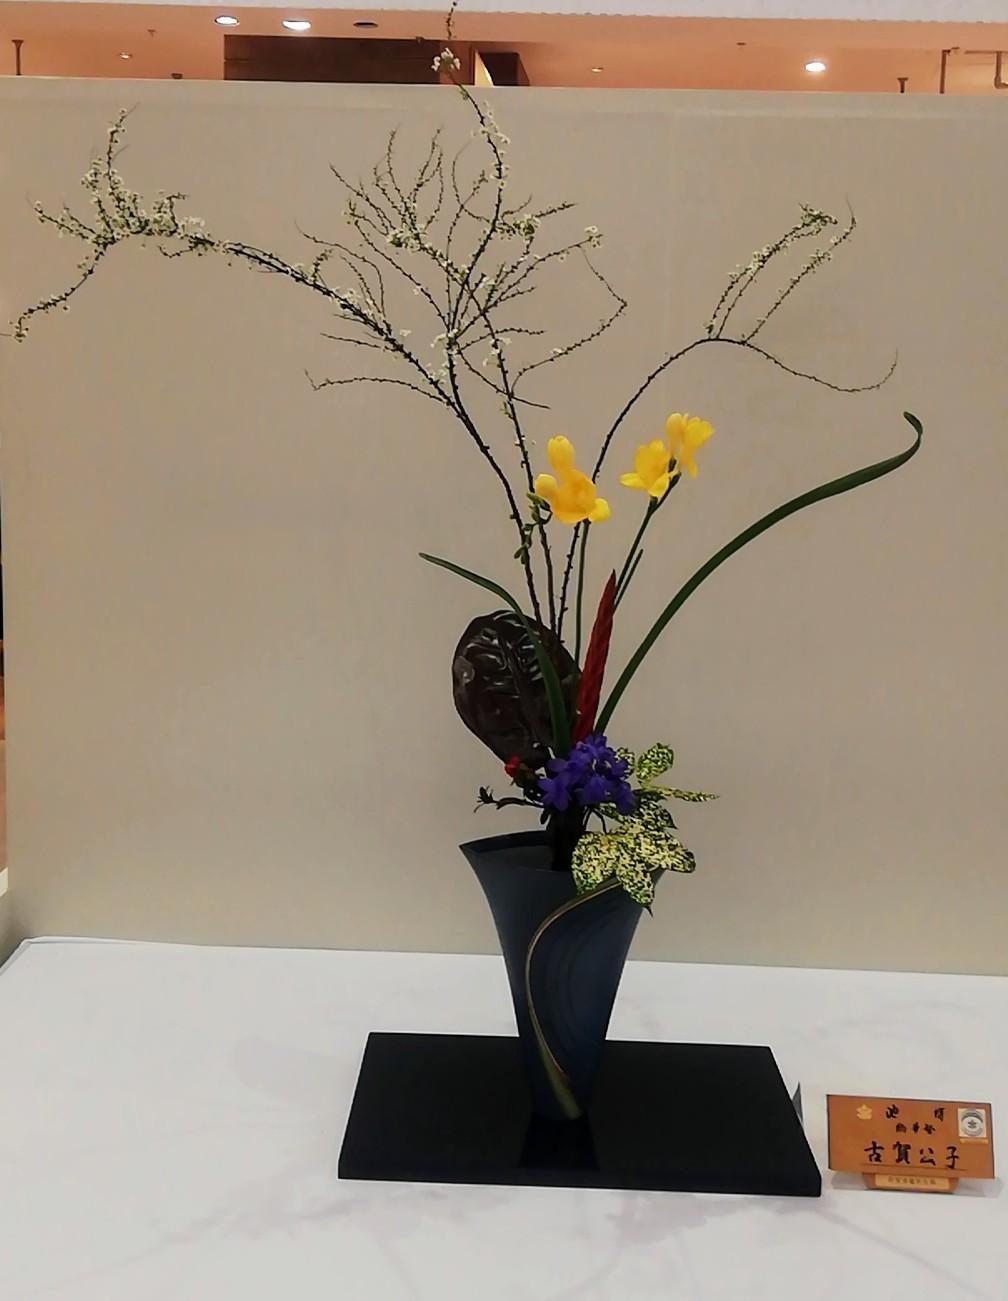 池坊佐賀県連合支部創立100周年記念いけばな池坊展 前期_d0195183_00155383.jpg